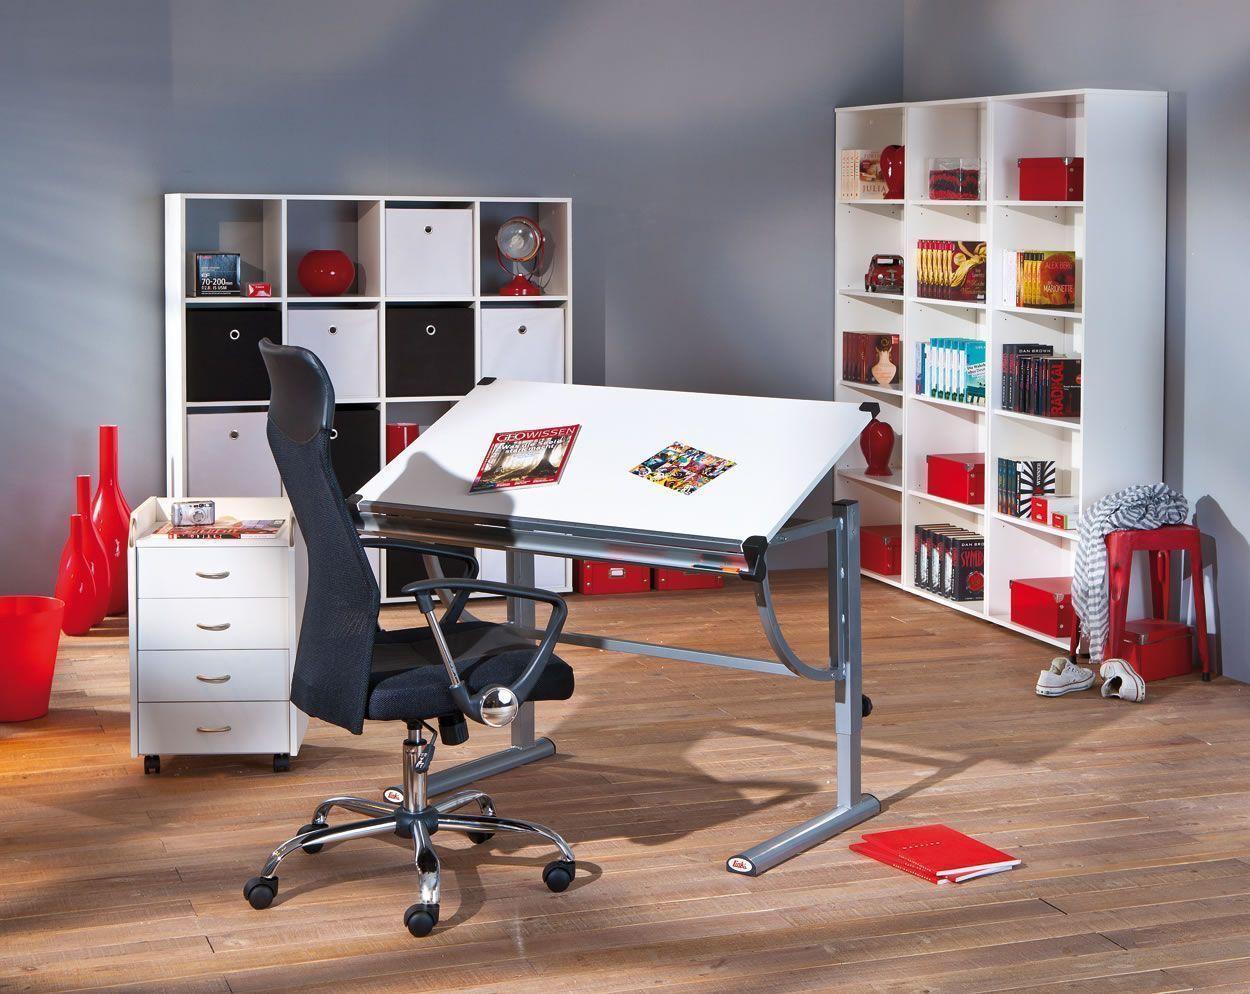 Bureau & espace de travail